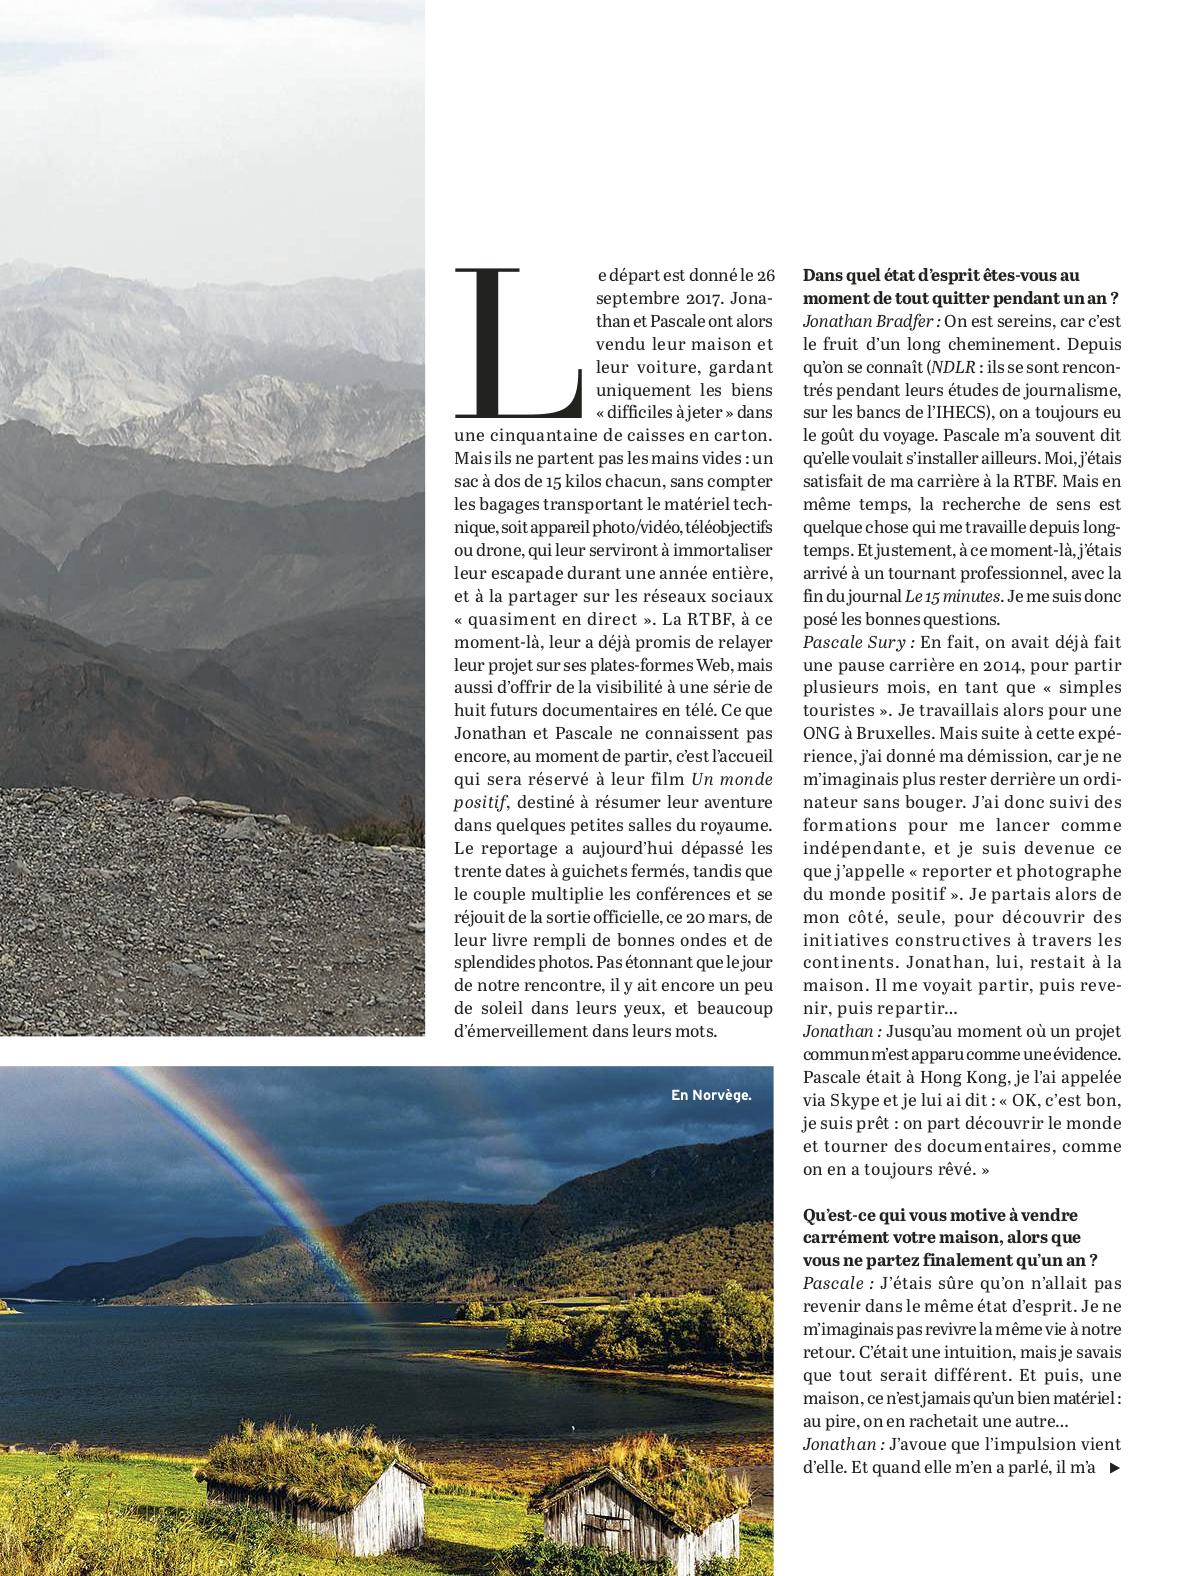 LW11-Voyage positif page 2.jpg